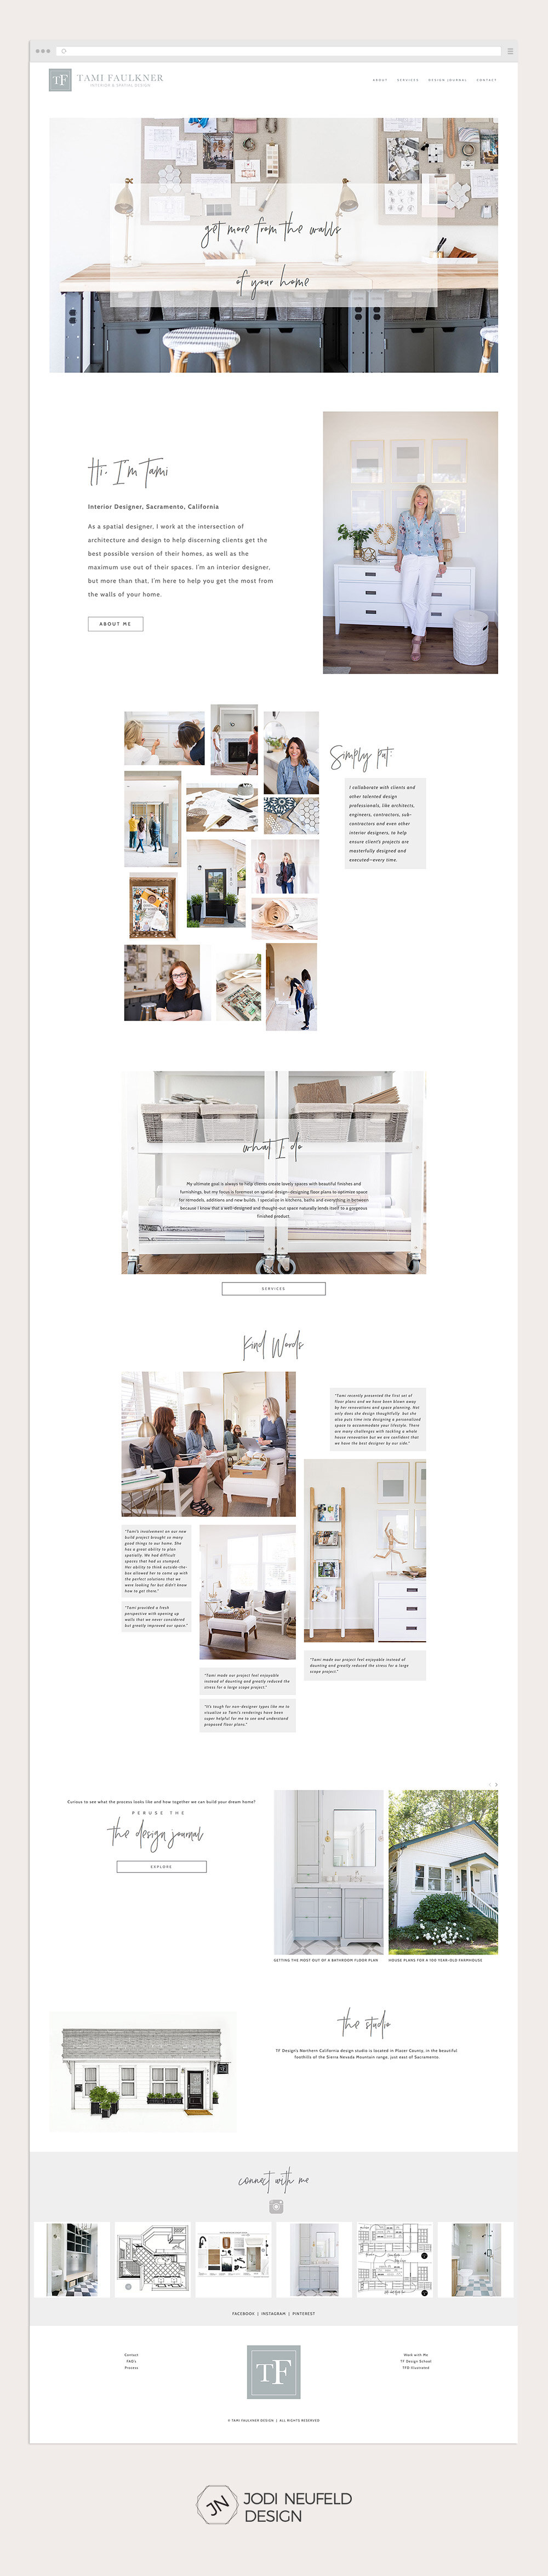 Tami Faulkner interior design website - Home page | Squarespace web design by Jodi Neufeld Design #squarespace #webdesign #interiordesign